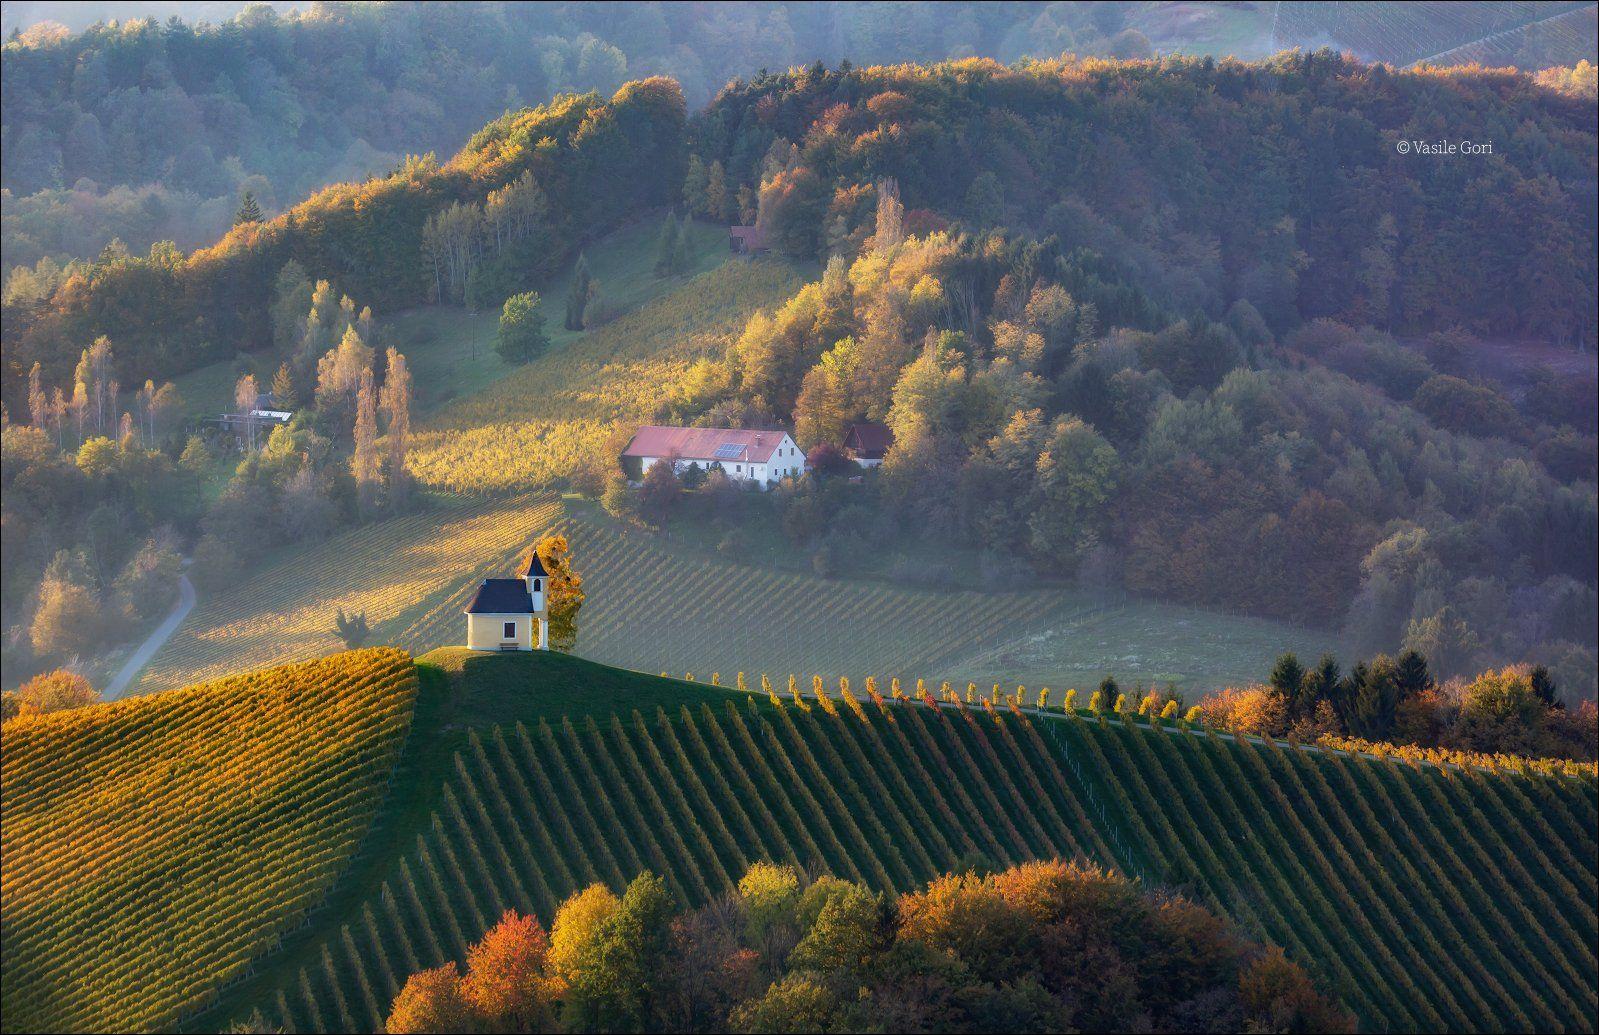 dreisiebner kapelle,свет,часовня,штирия,chapel,гамлитц,австрия,gamlitz- sernau,landscape,панорама,осень, Василий Гори.